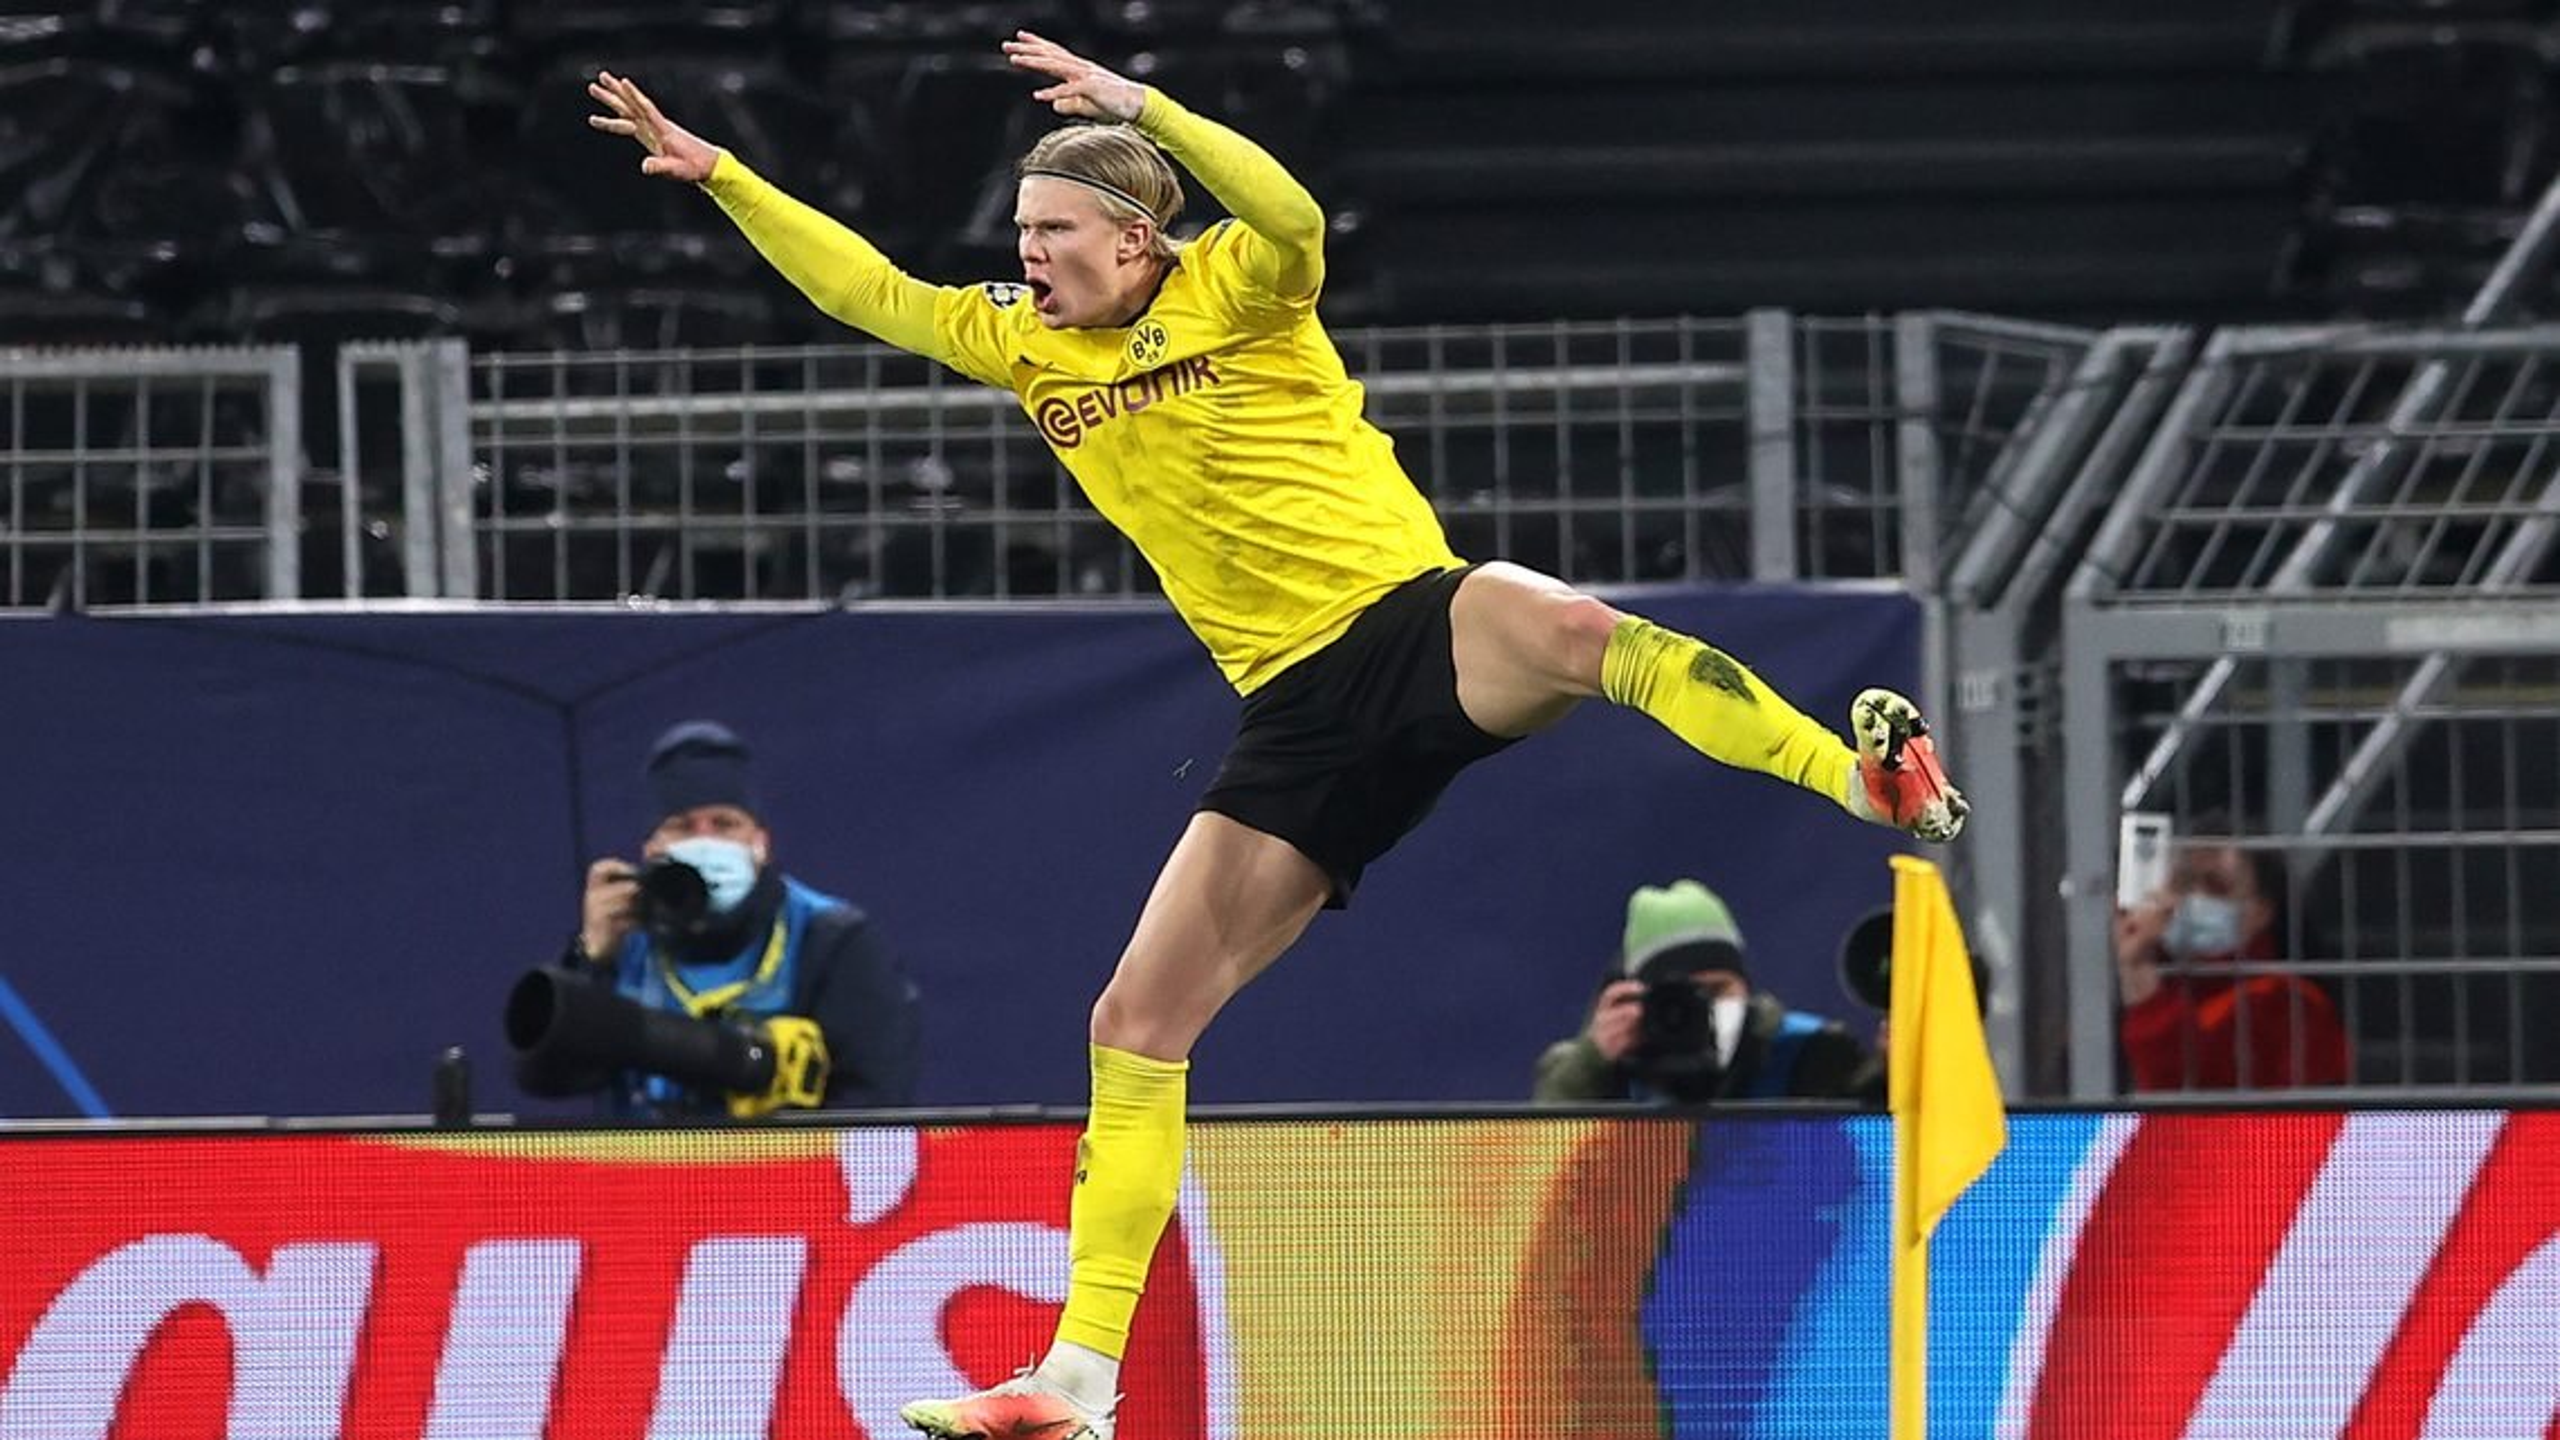 Bundesliga | Erling Haaland double against Sevilla helps Borussia Dortmund  into UEFA Champions League quarter-finals